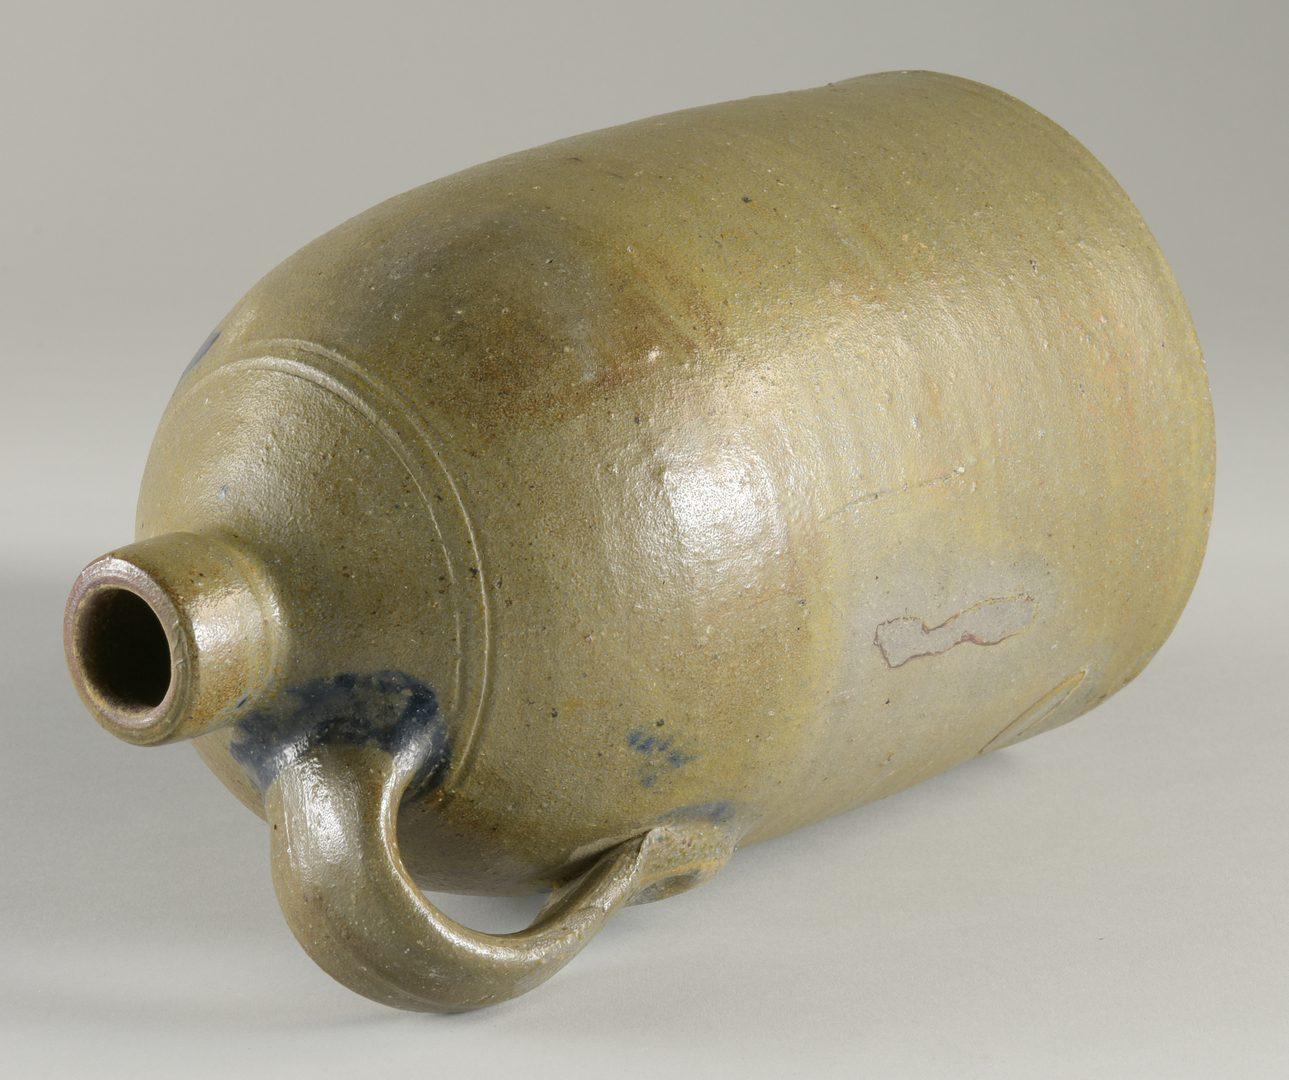 Lot 124: East TN Stoneware Jug, attr. to Charles Decker